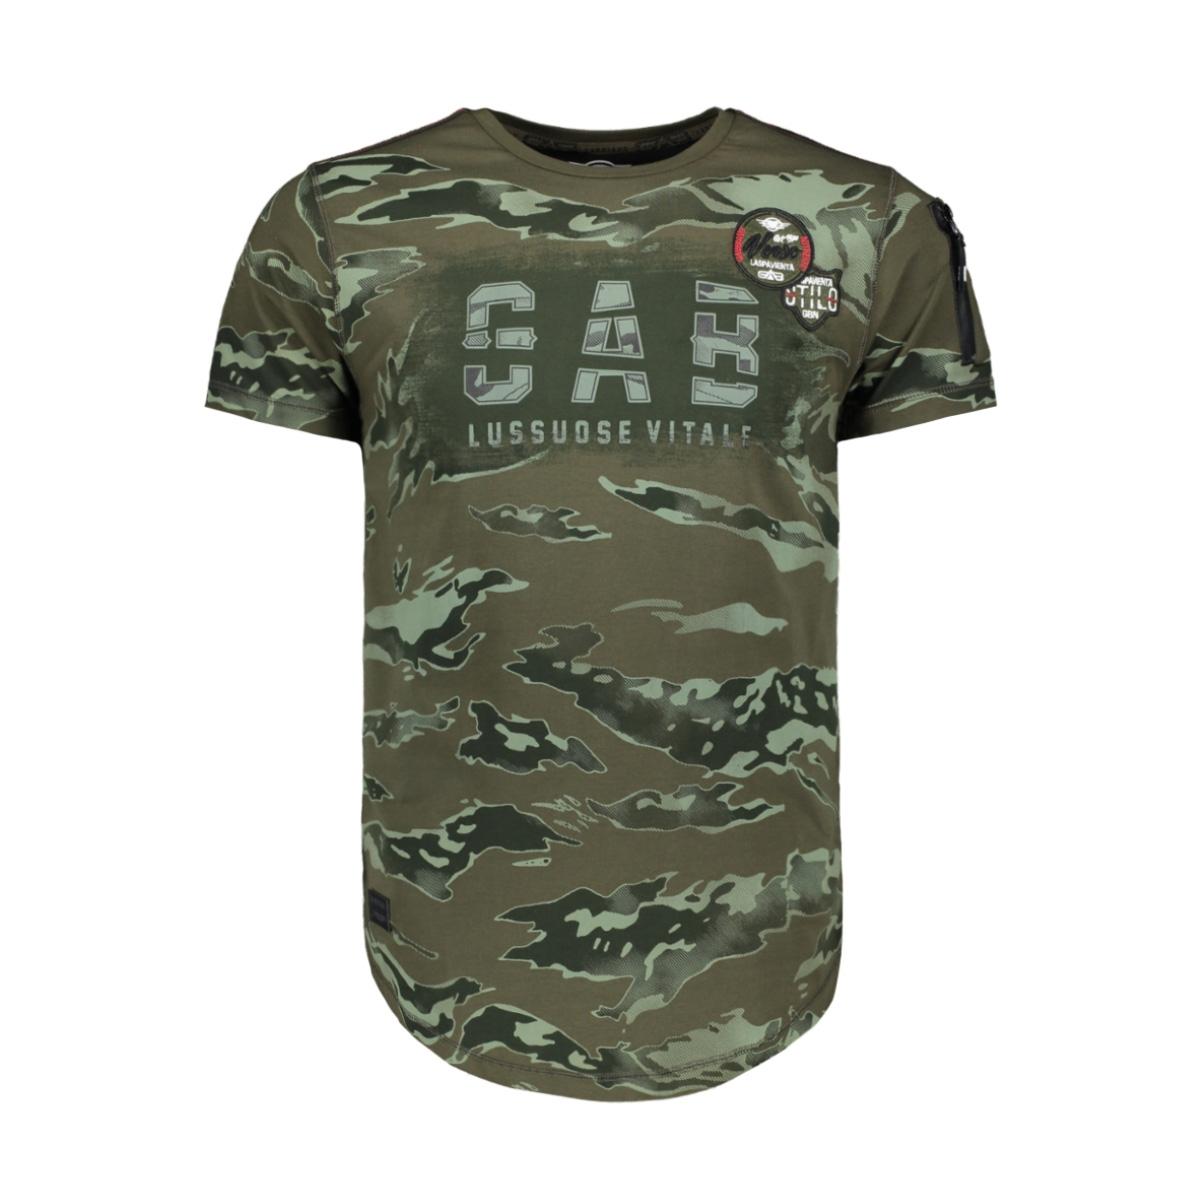 t shirt 13882 gabbiano t-shirt army